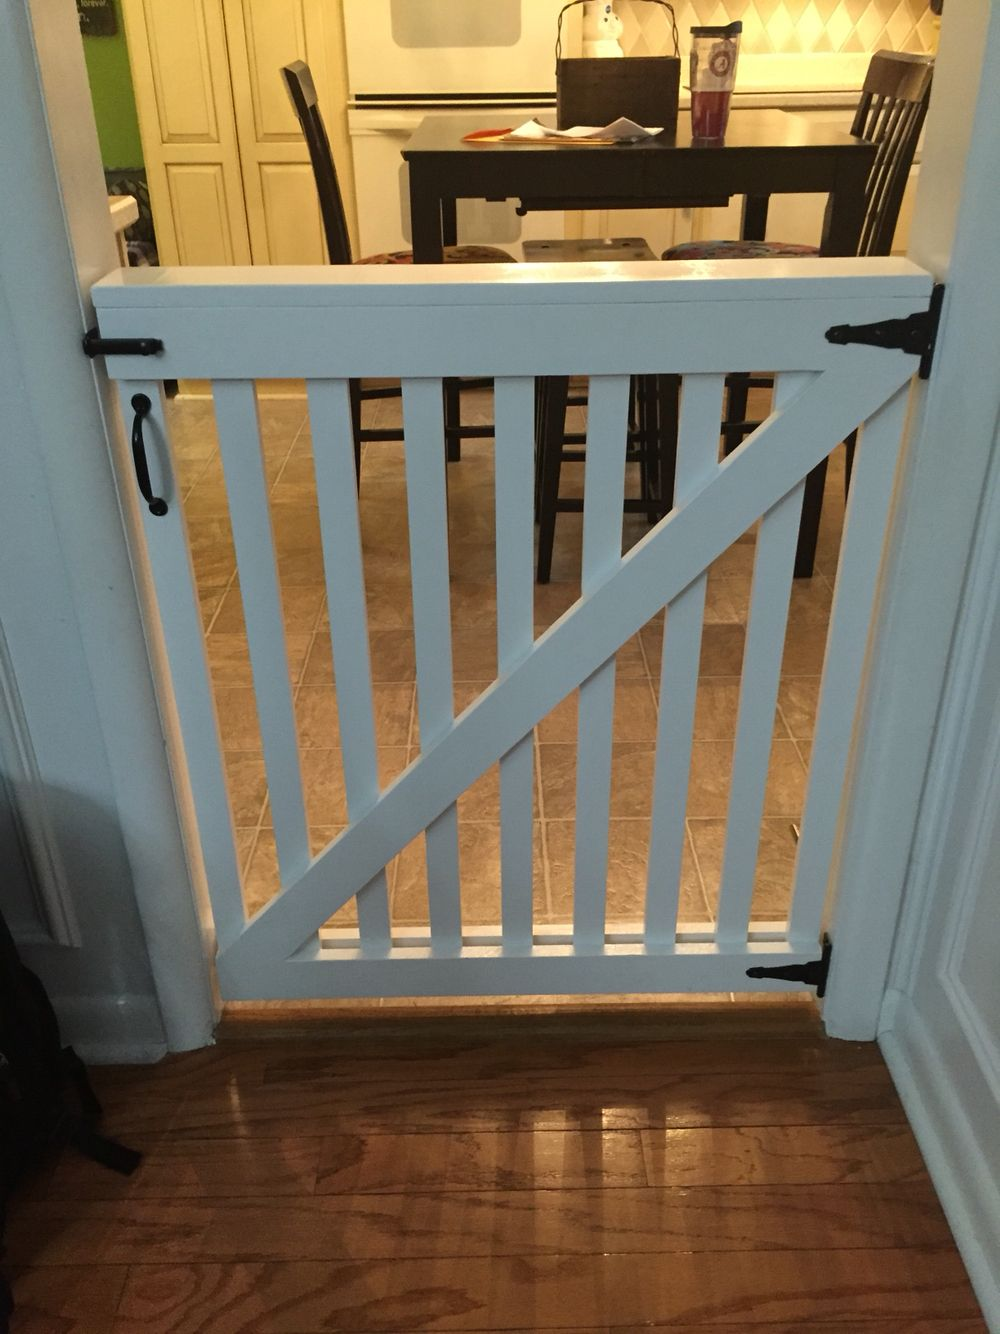 New Hallway Dog Gate